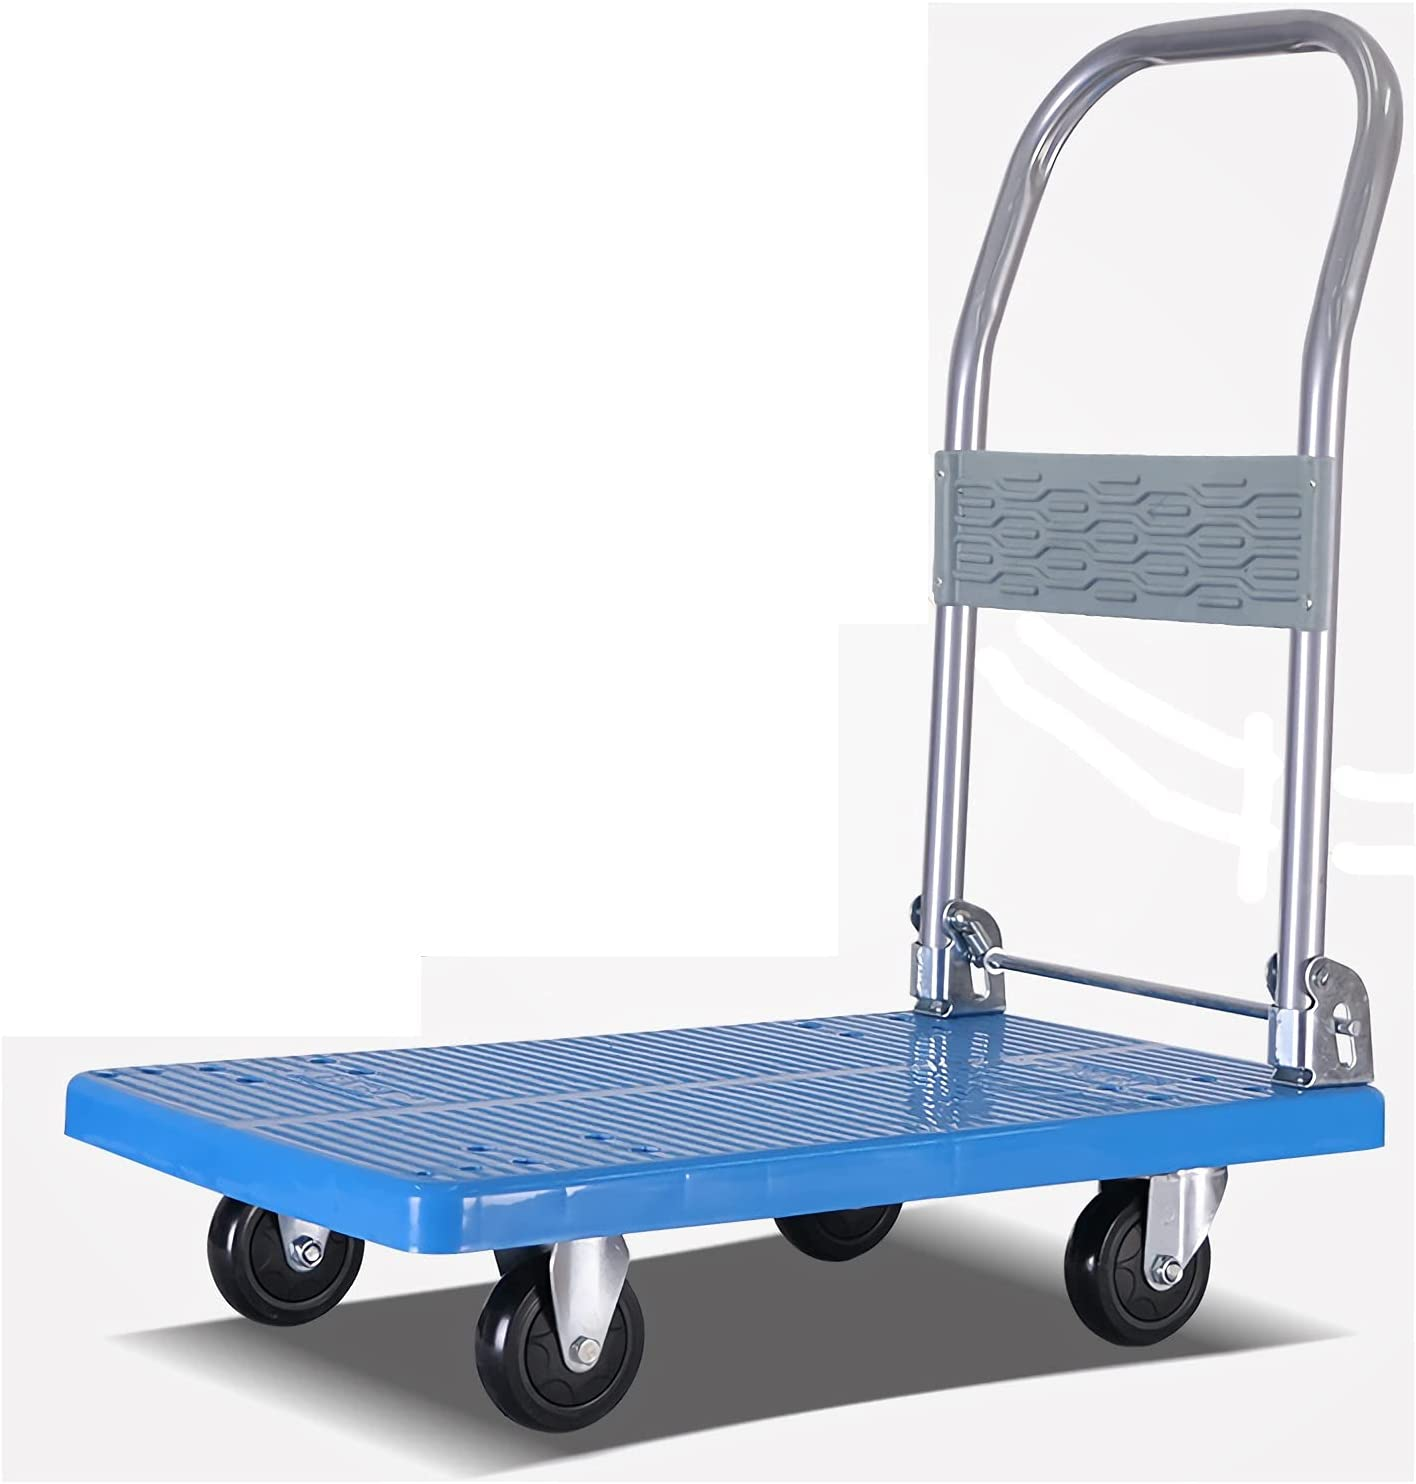 DALIZHAI777 Platform Cart Truck Hand Mesa Mall Thicken with Max 53% OFF